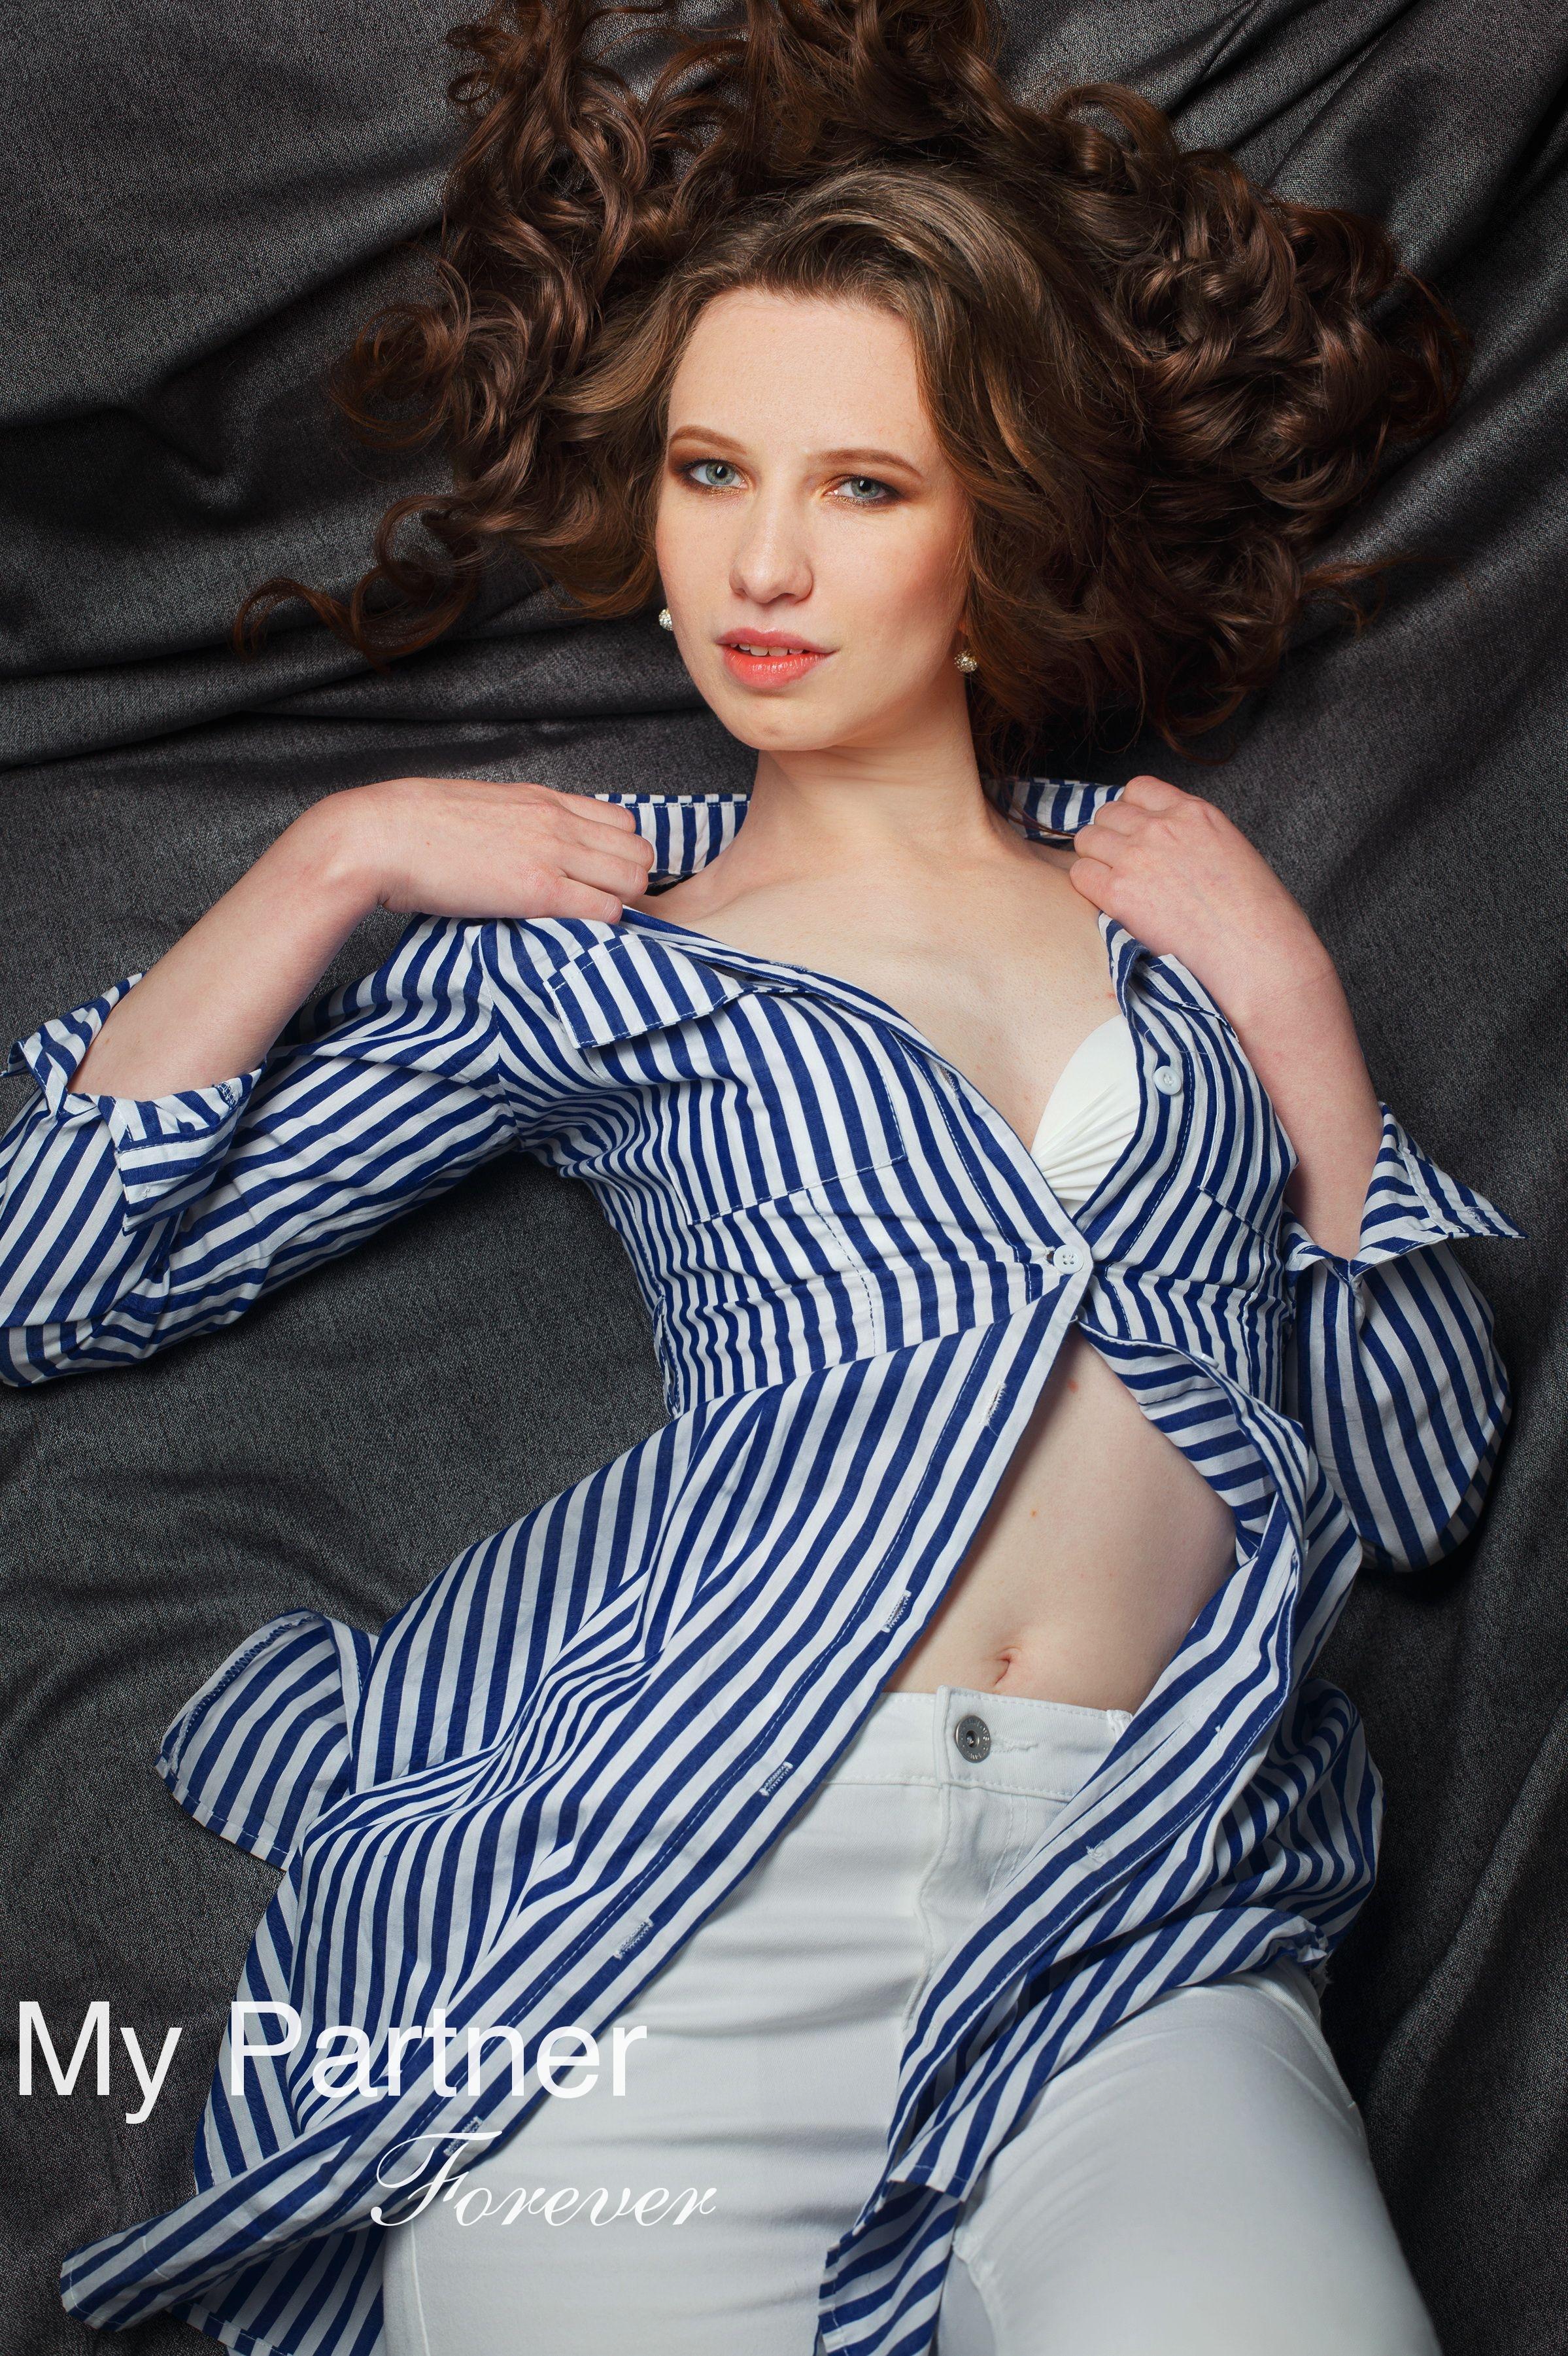 Stunning Lady from Belarus - Karina from Grodno, Belarus